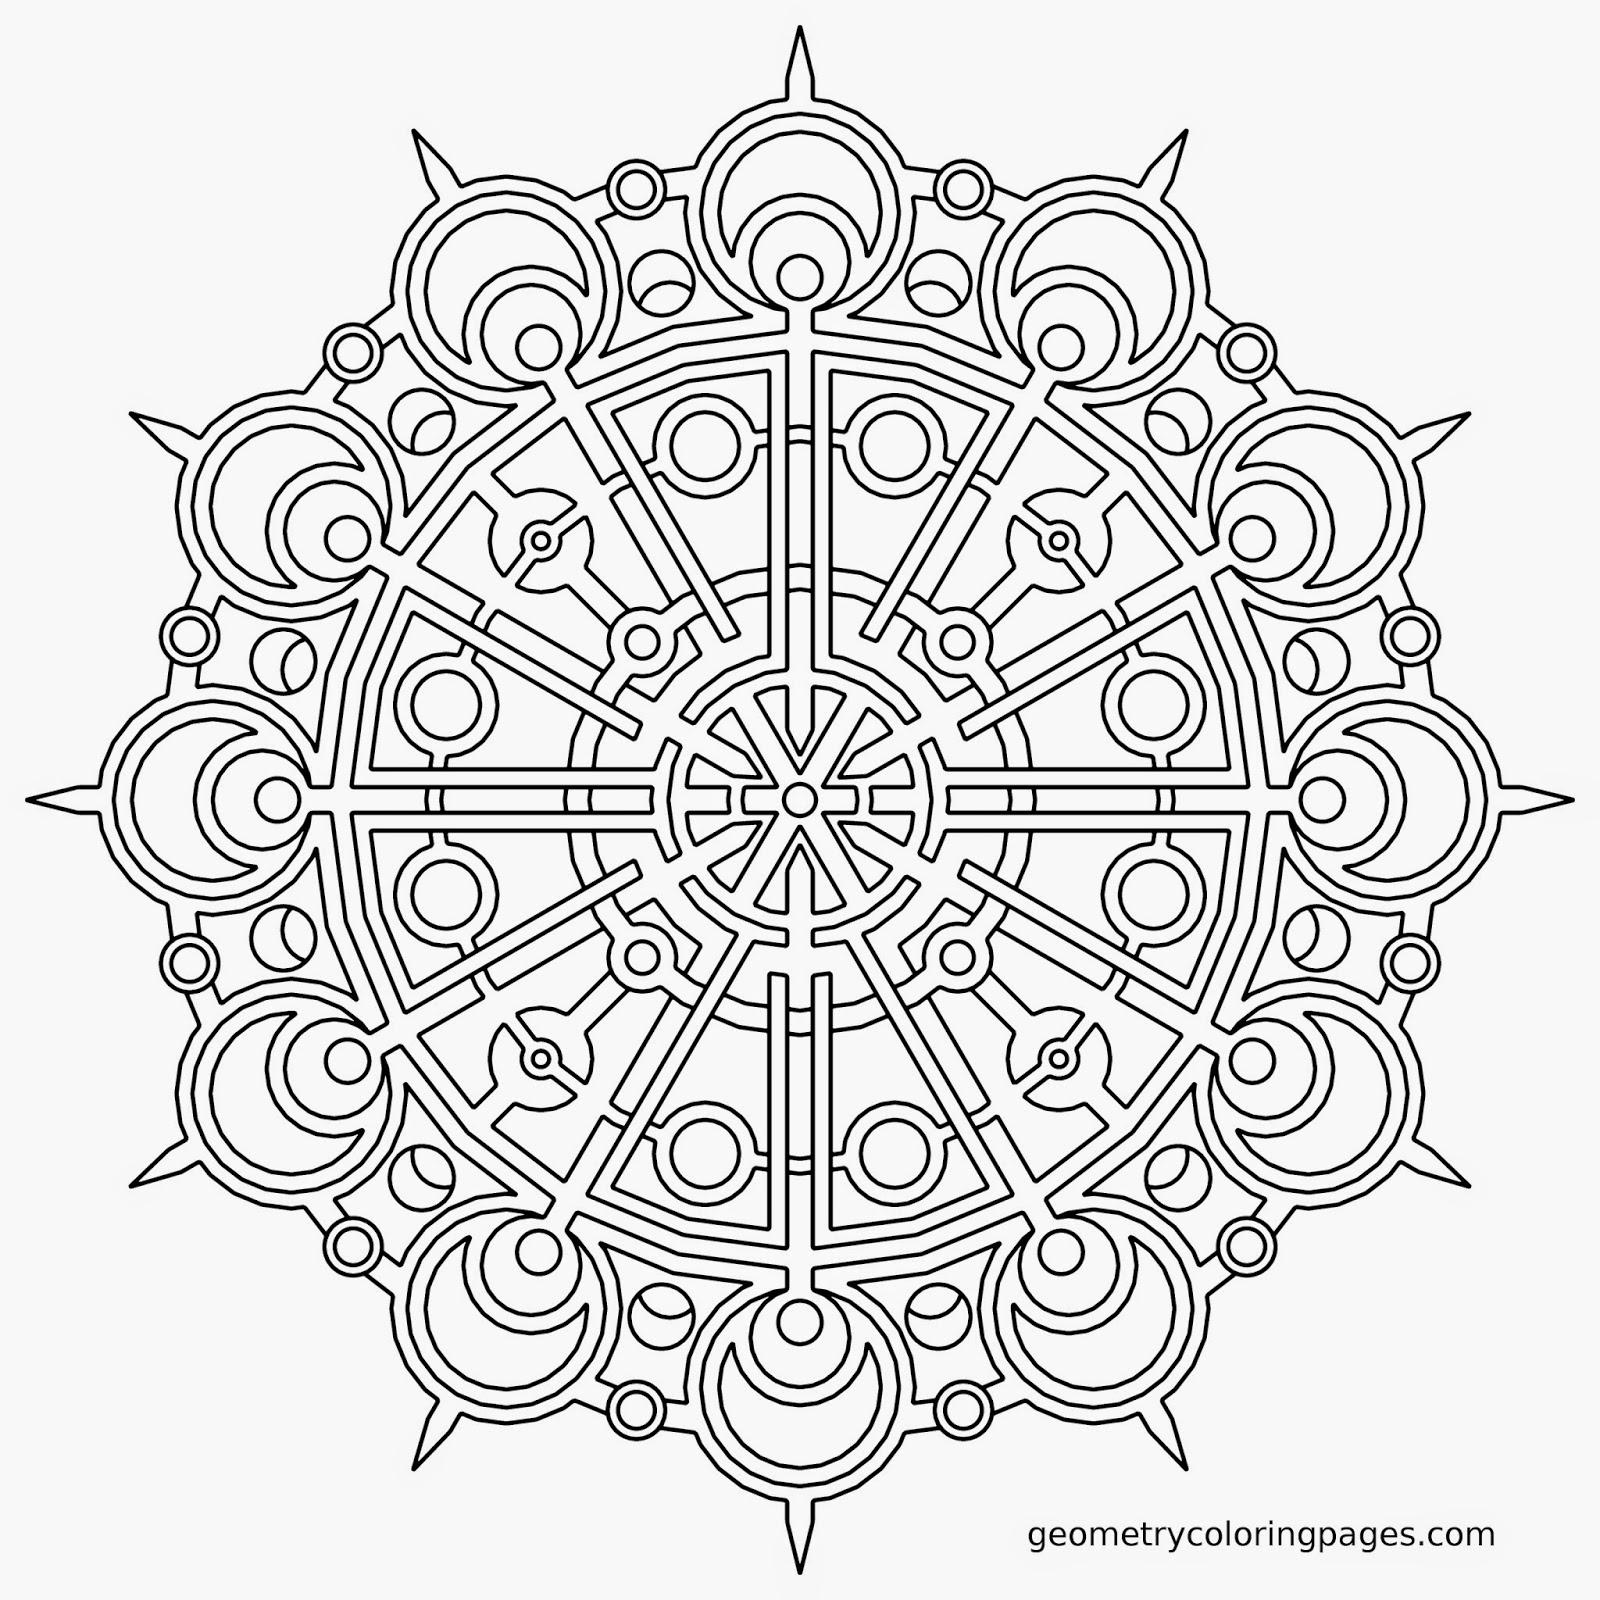 pinterest mandala coloring pages - photo#22